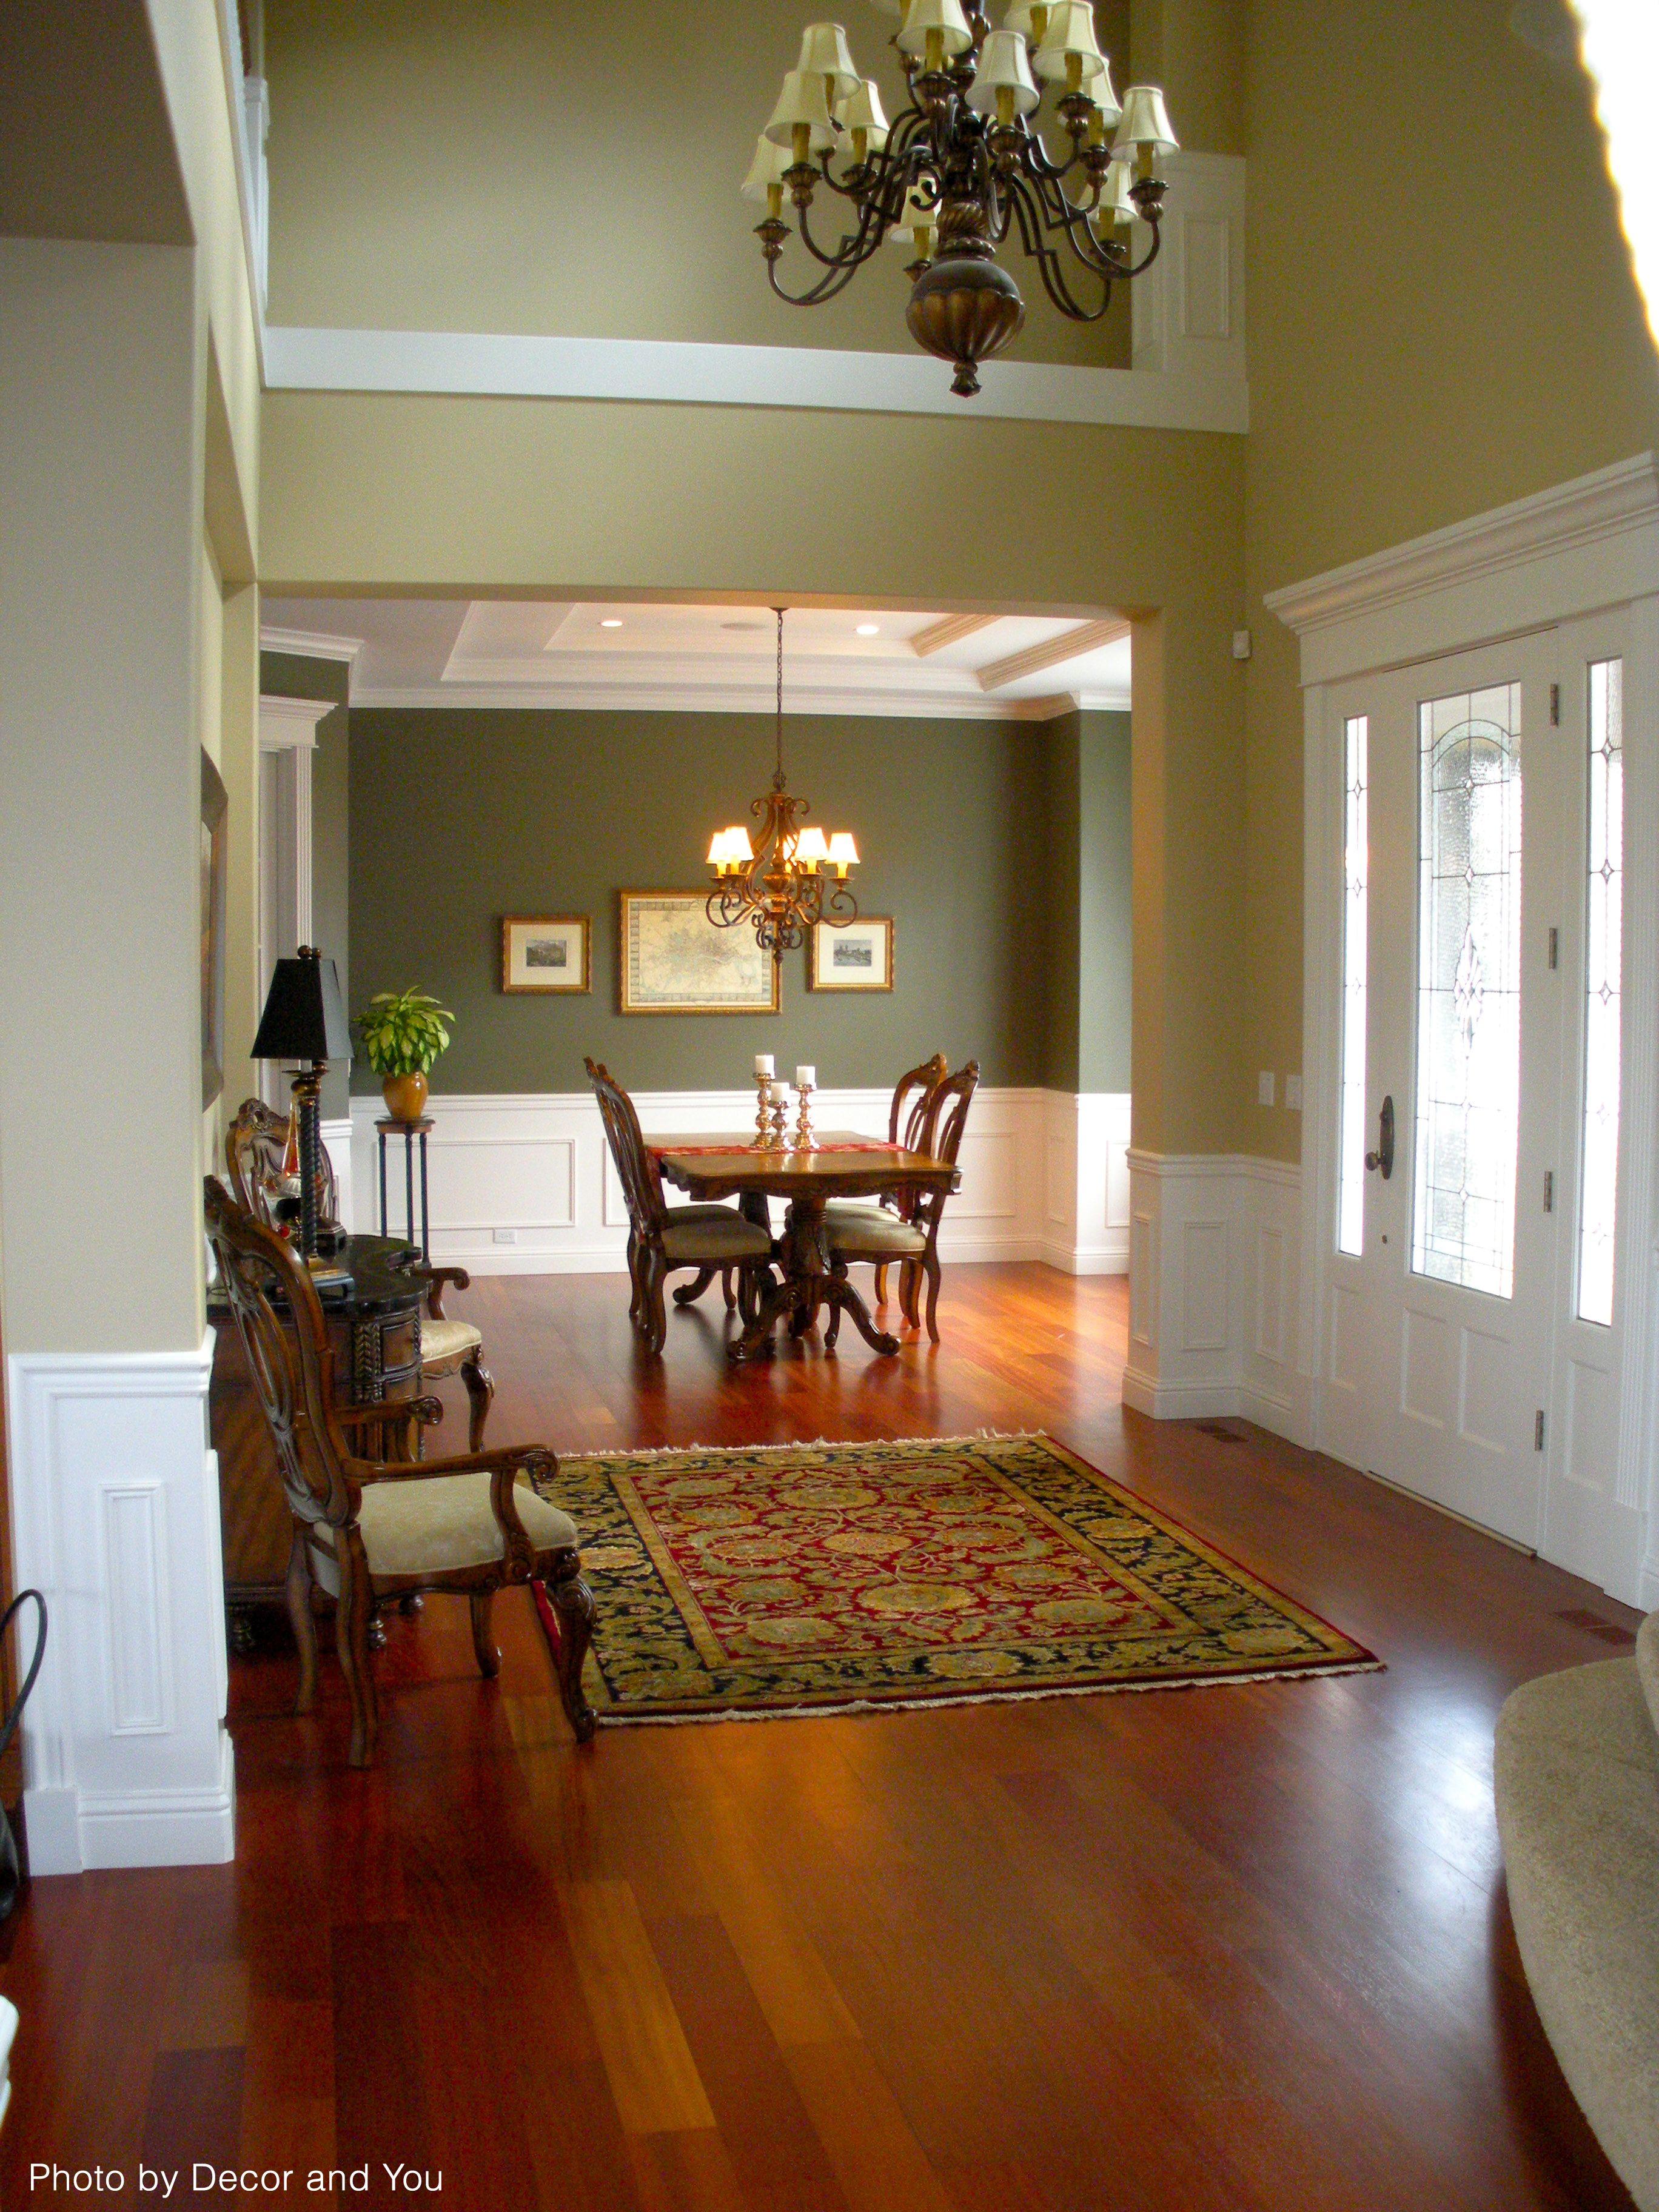 Top Tips For Cleaning Hardwood Floors Cherry wood floors